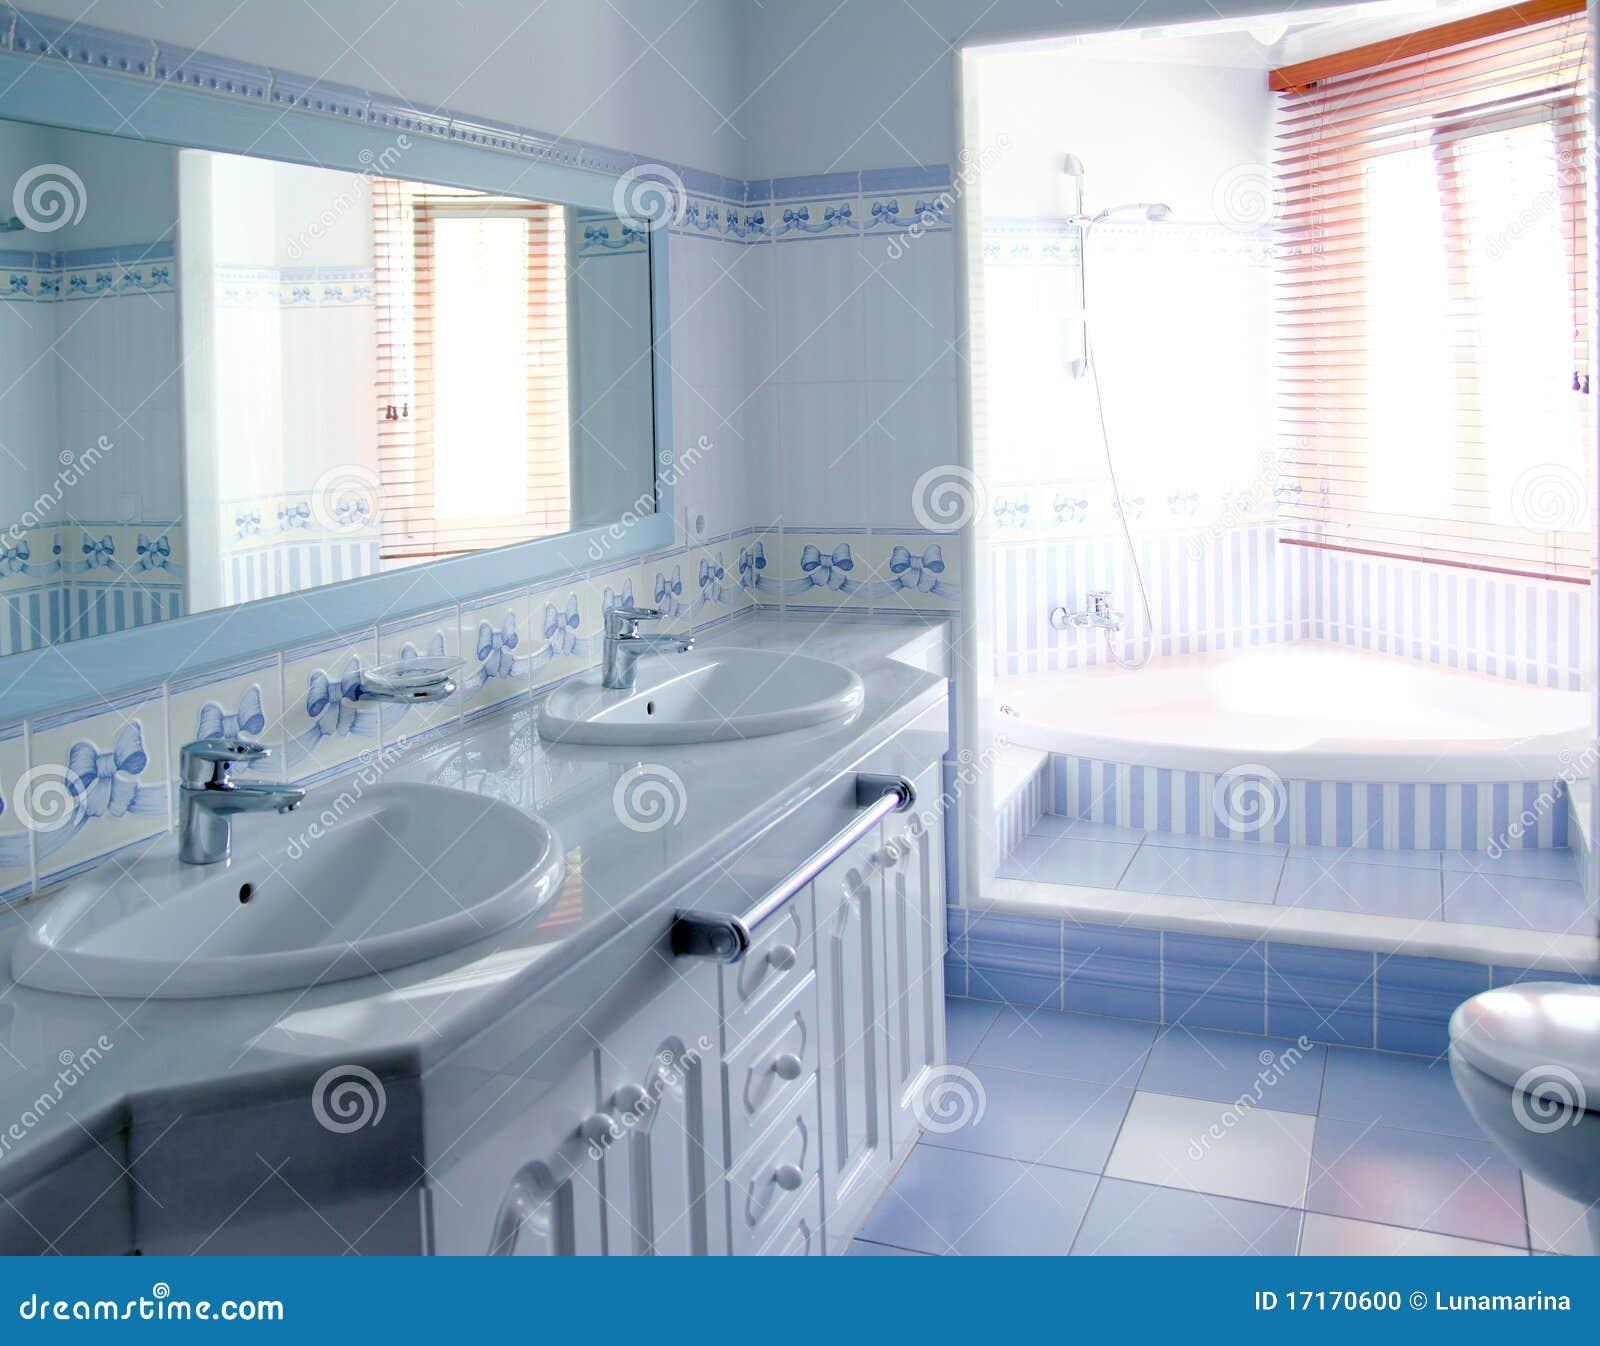 Classic Blue Bathroom Interior Tiles Decoration Stock Photo Image 17170600